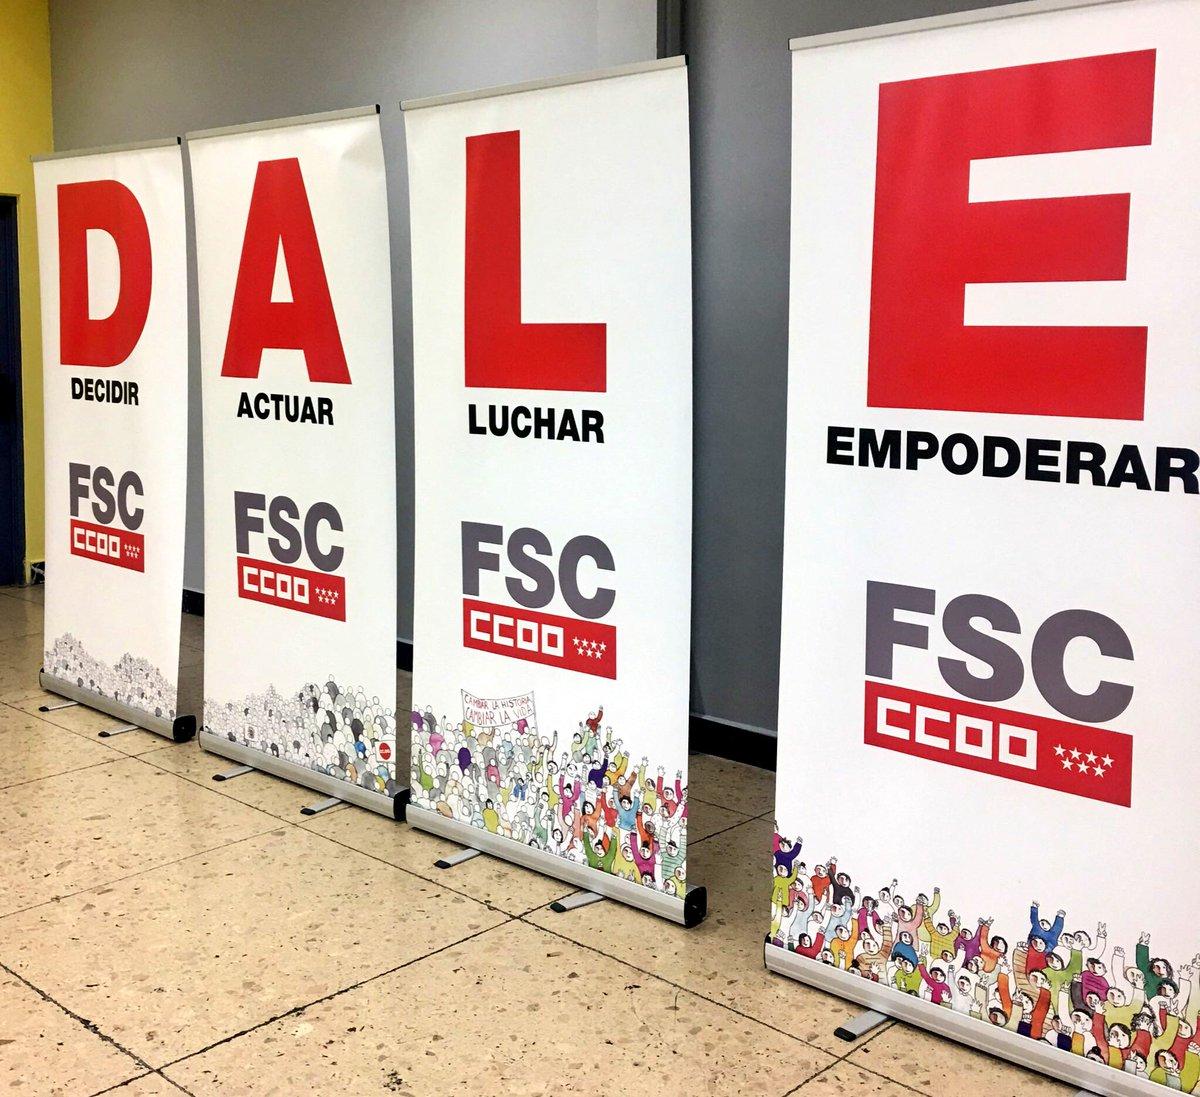 #Decidir  #Actuar  #Luchar  #Empoderar  3er Congreso @CCOO_FSCMadrid #CCOO<br>http://pic.twitter.com/i3CMEMqXTX